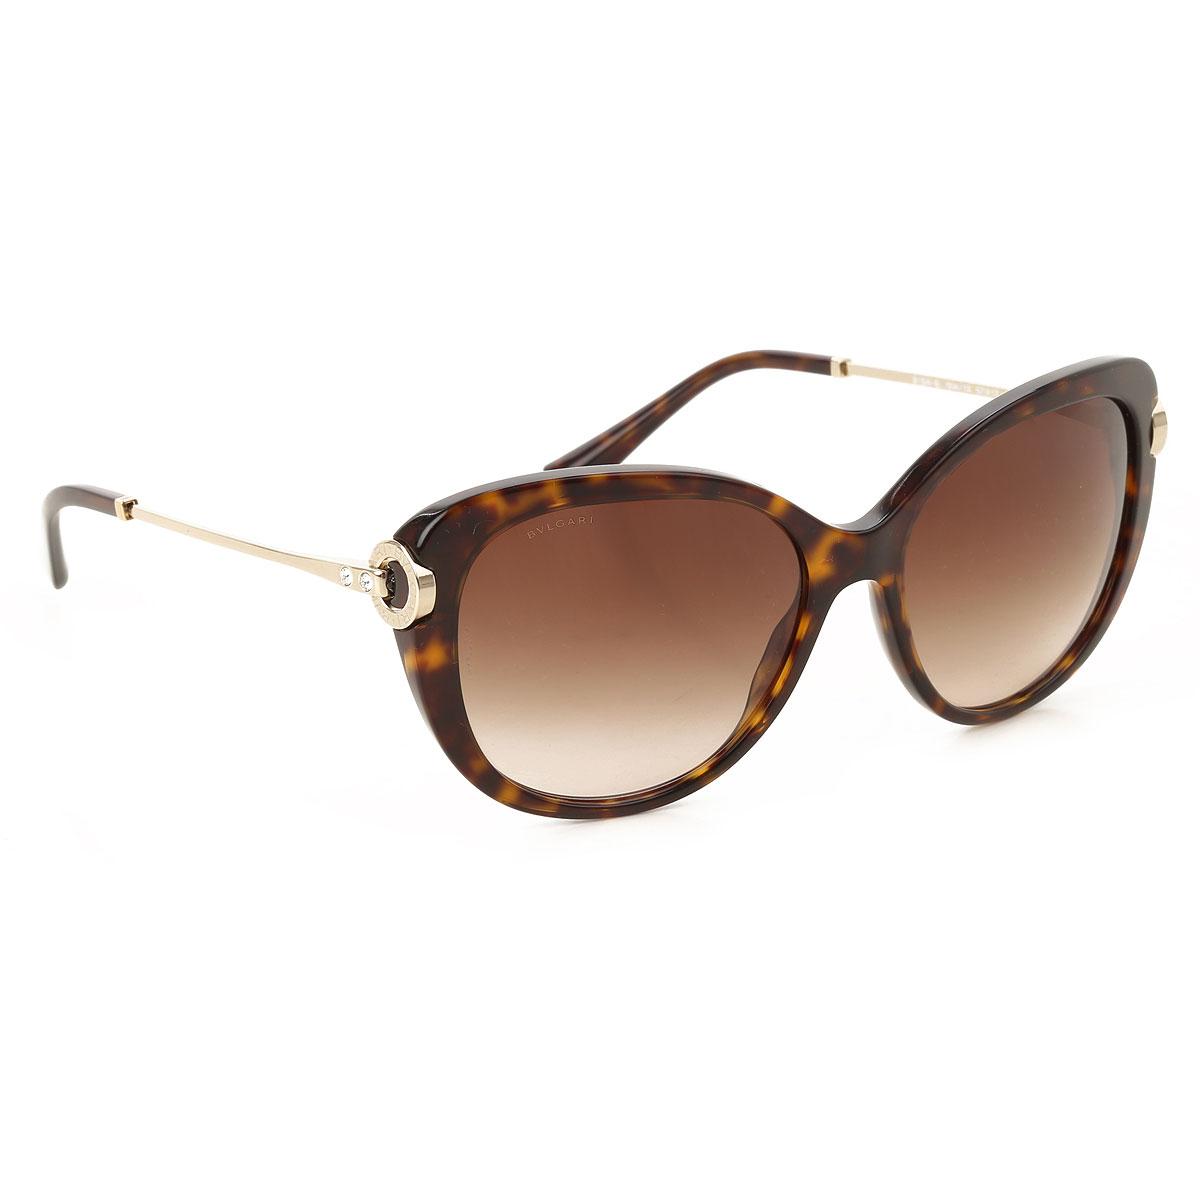 Image of Bvlgari Sunglasses On Sale, Dark Havana, 2017